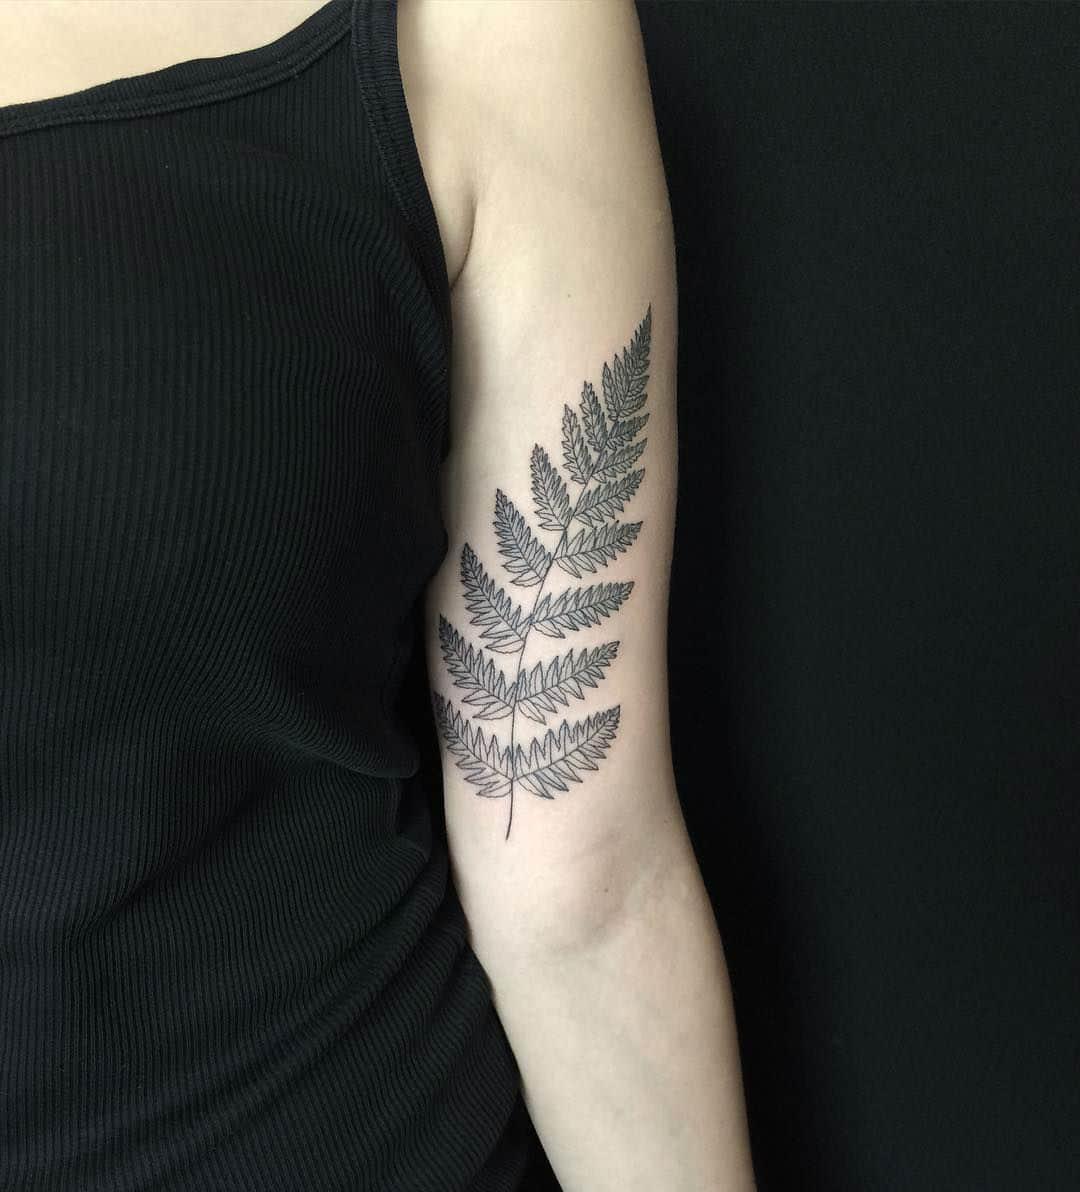 Gifted Ukrainian Artist Creates Stunning Floral Tattoos